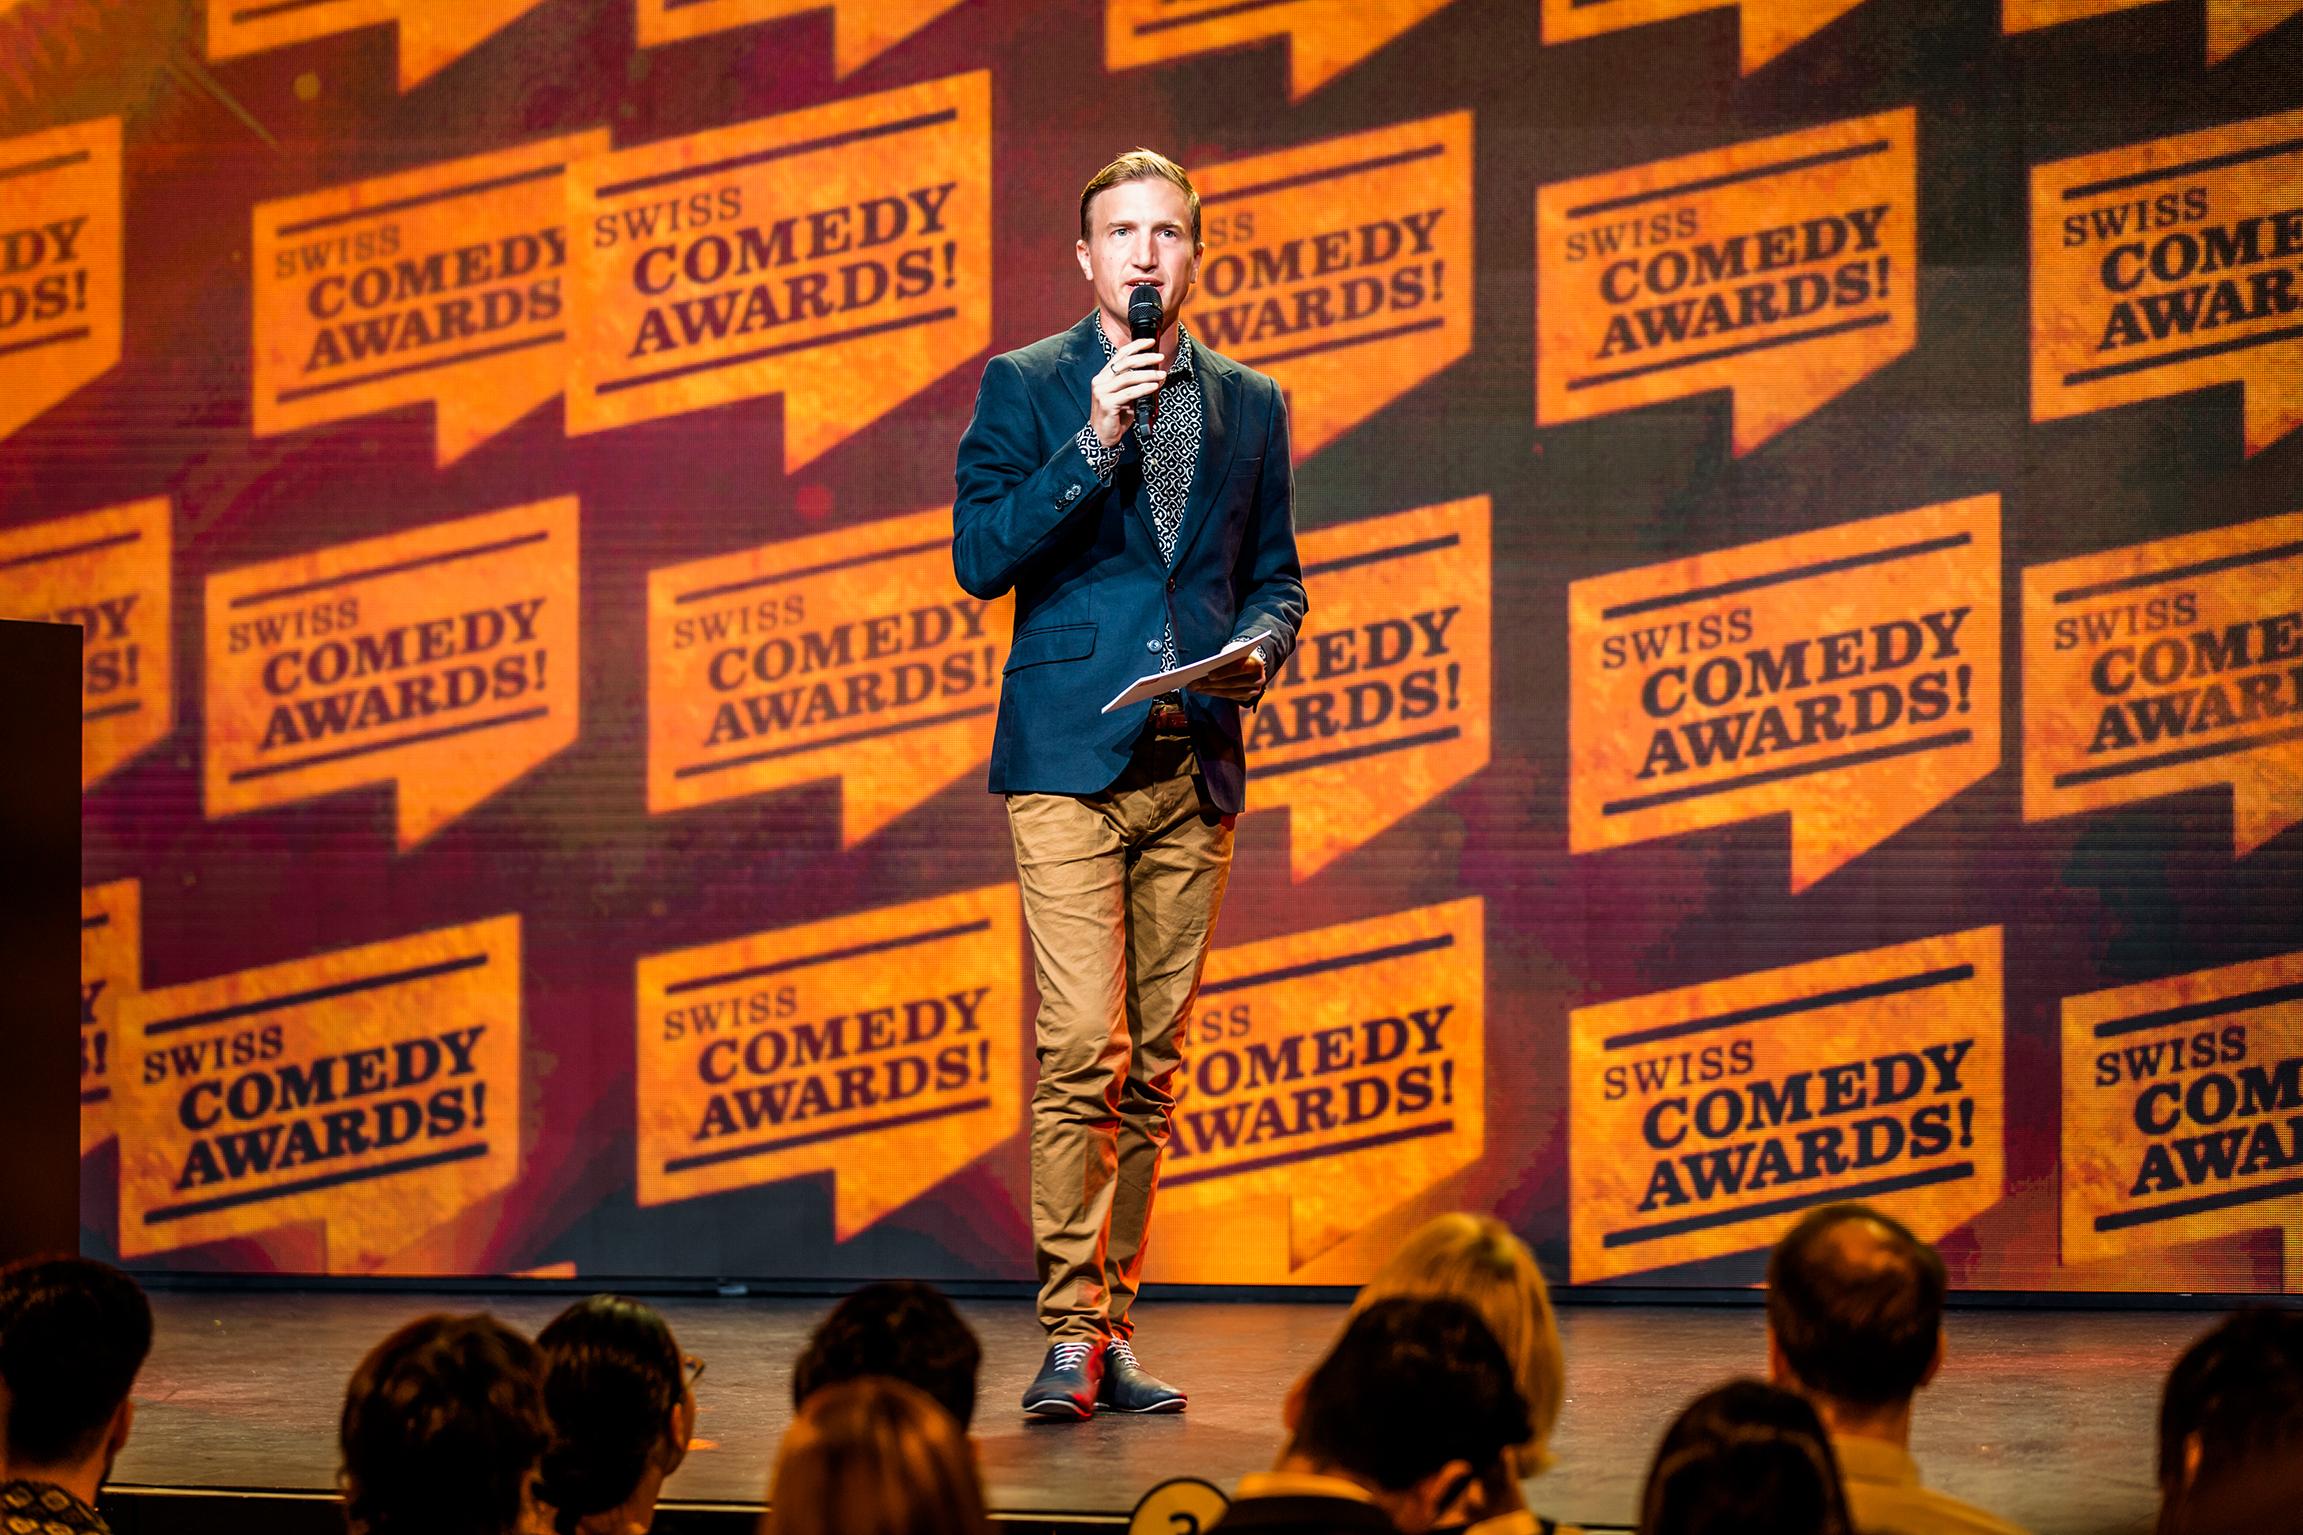 Satellite Awards/Fernsehen/Bestes Ensemble